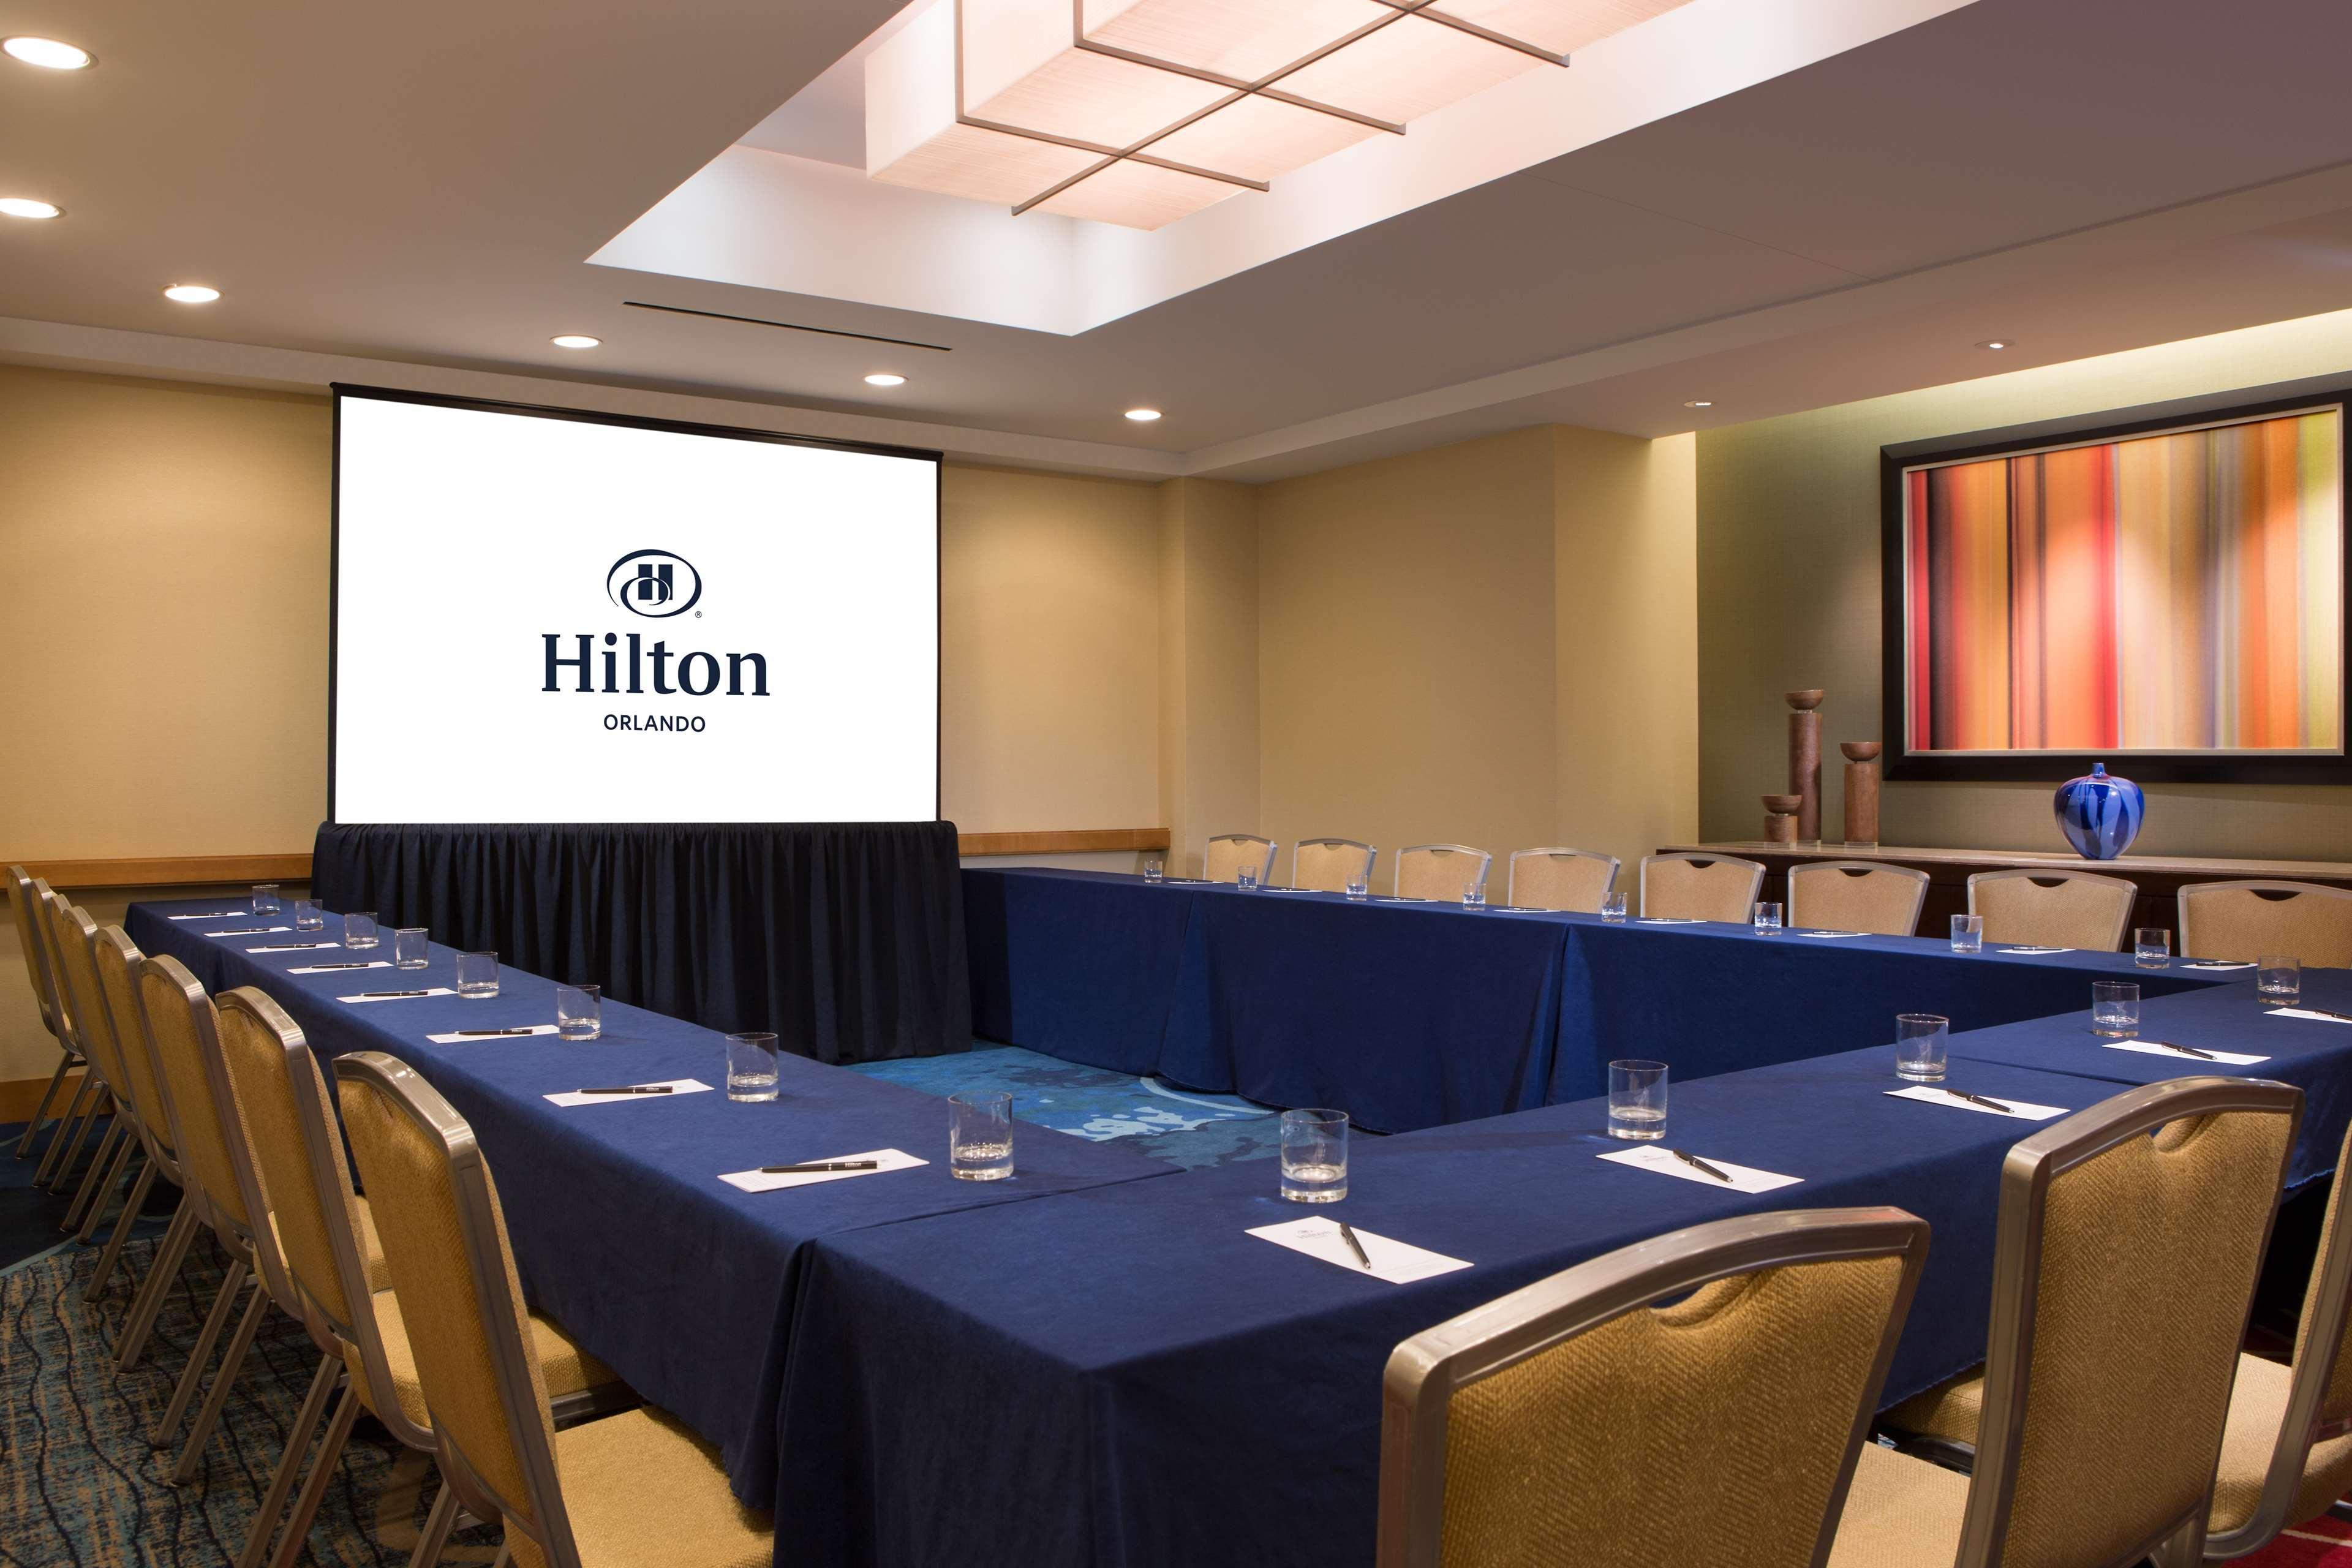 Hilton Orlando image 42